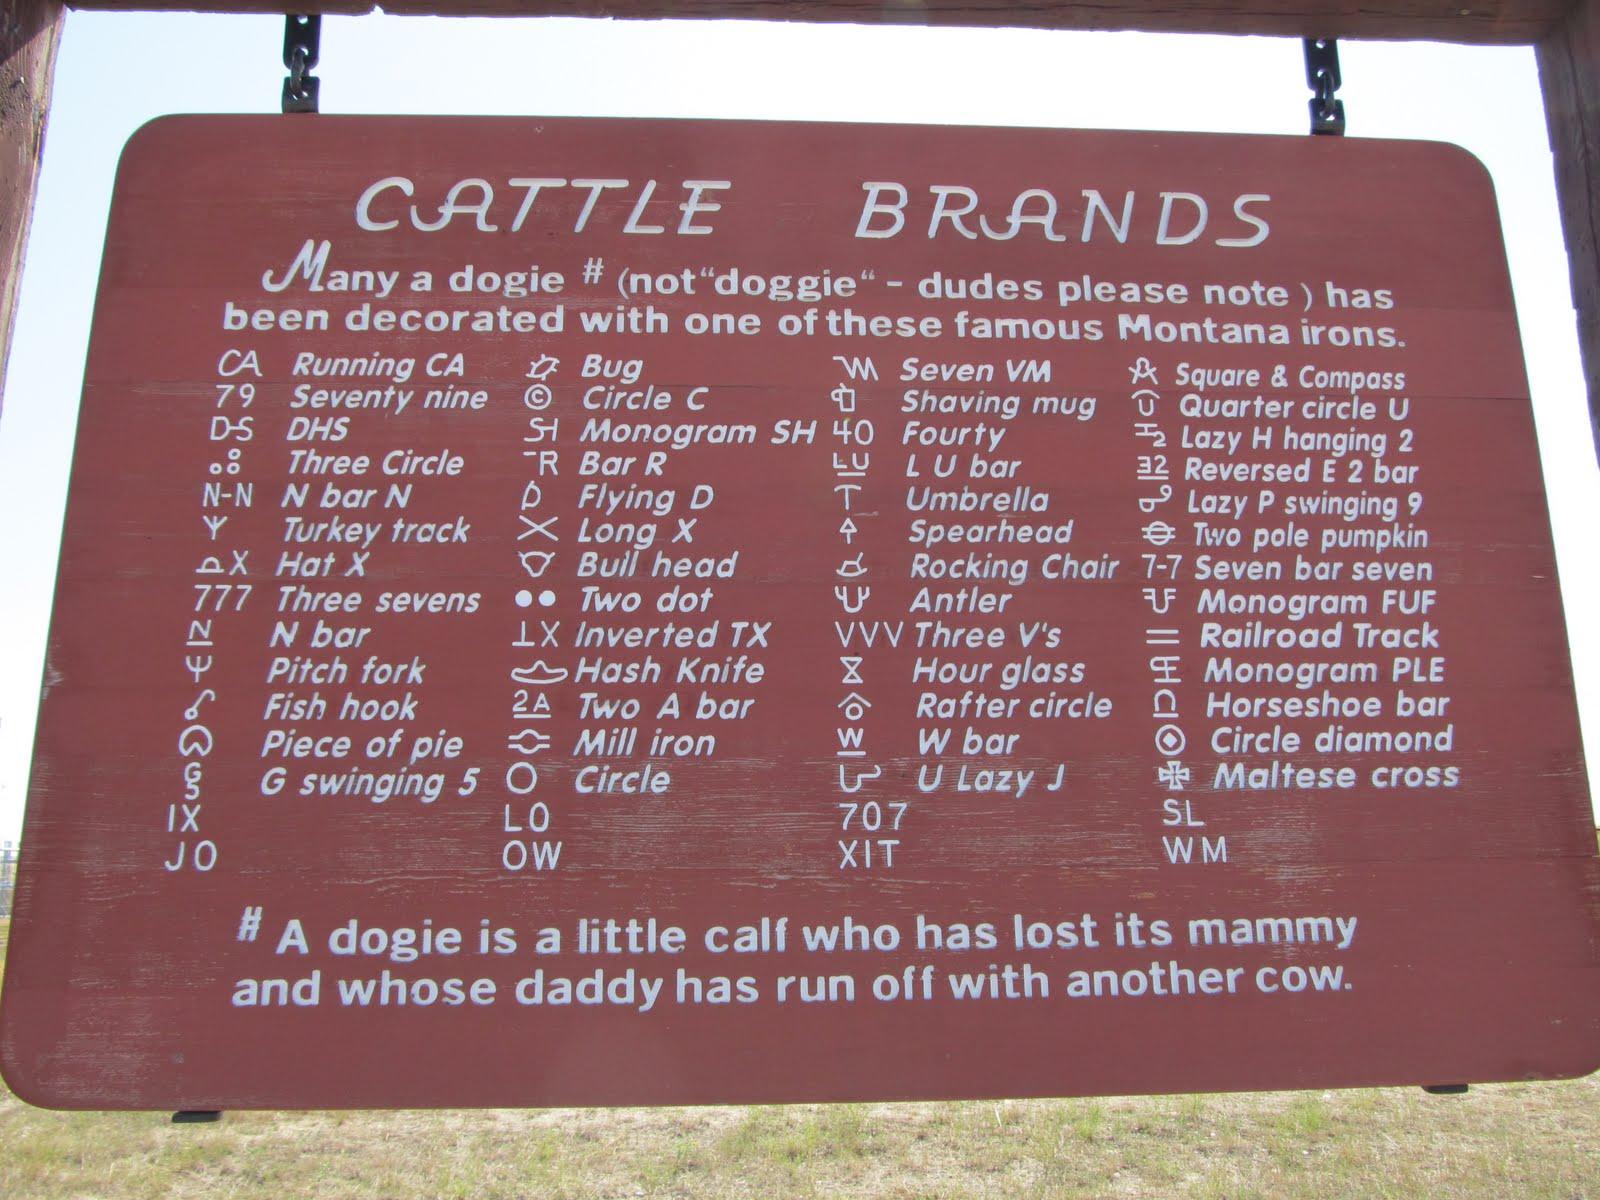 V Cattle Brands Manhattan to Astoria (...